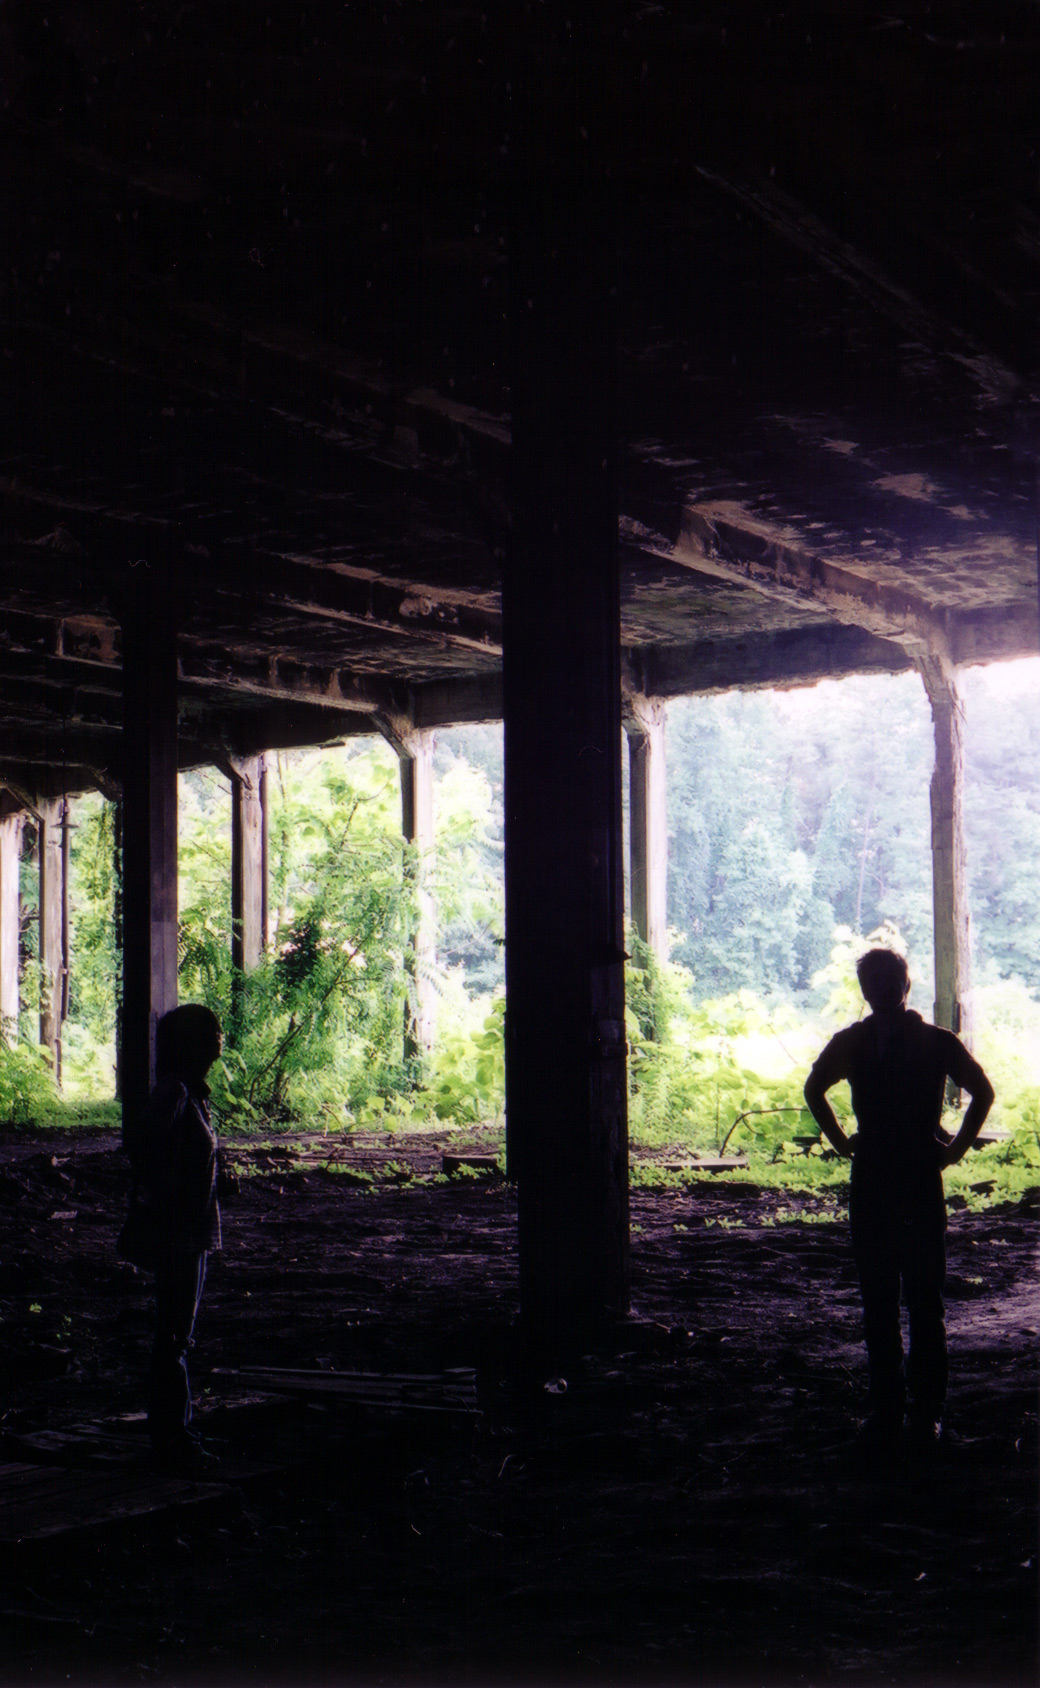 rothrock-silhouette-1.jpg